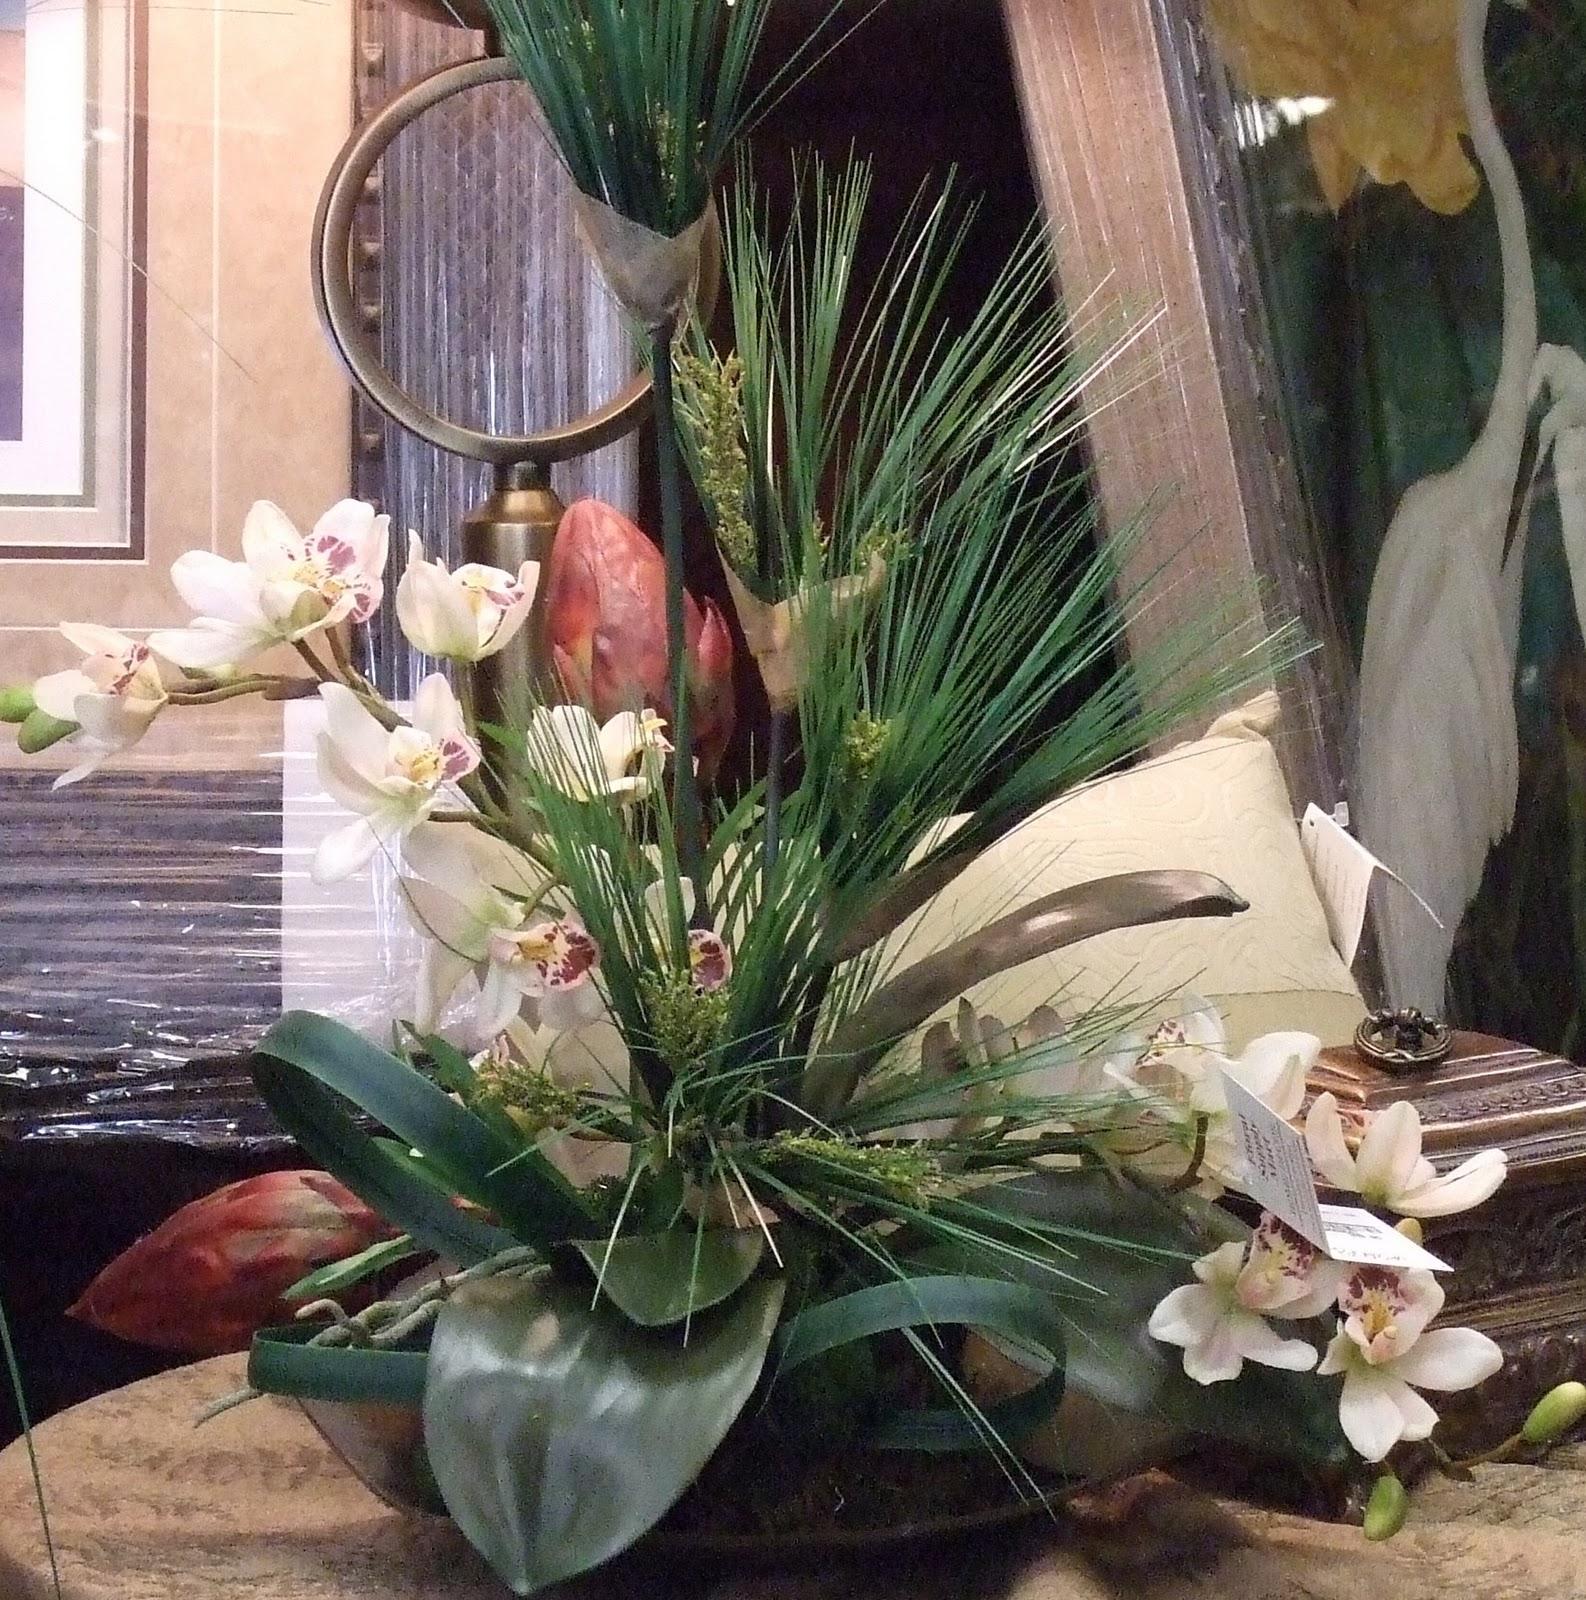 Ana Silk Flowers Imageslk Orchid Flowers Arrangements